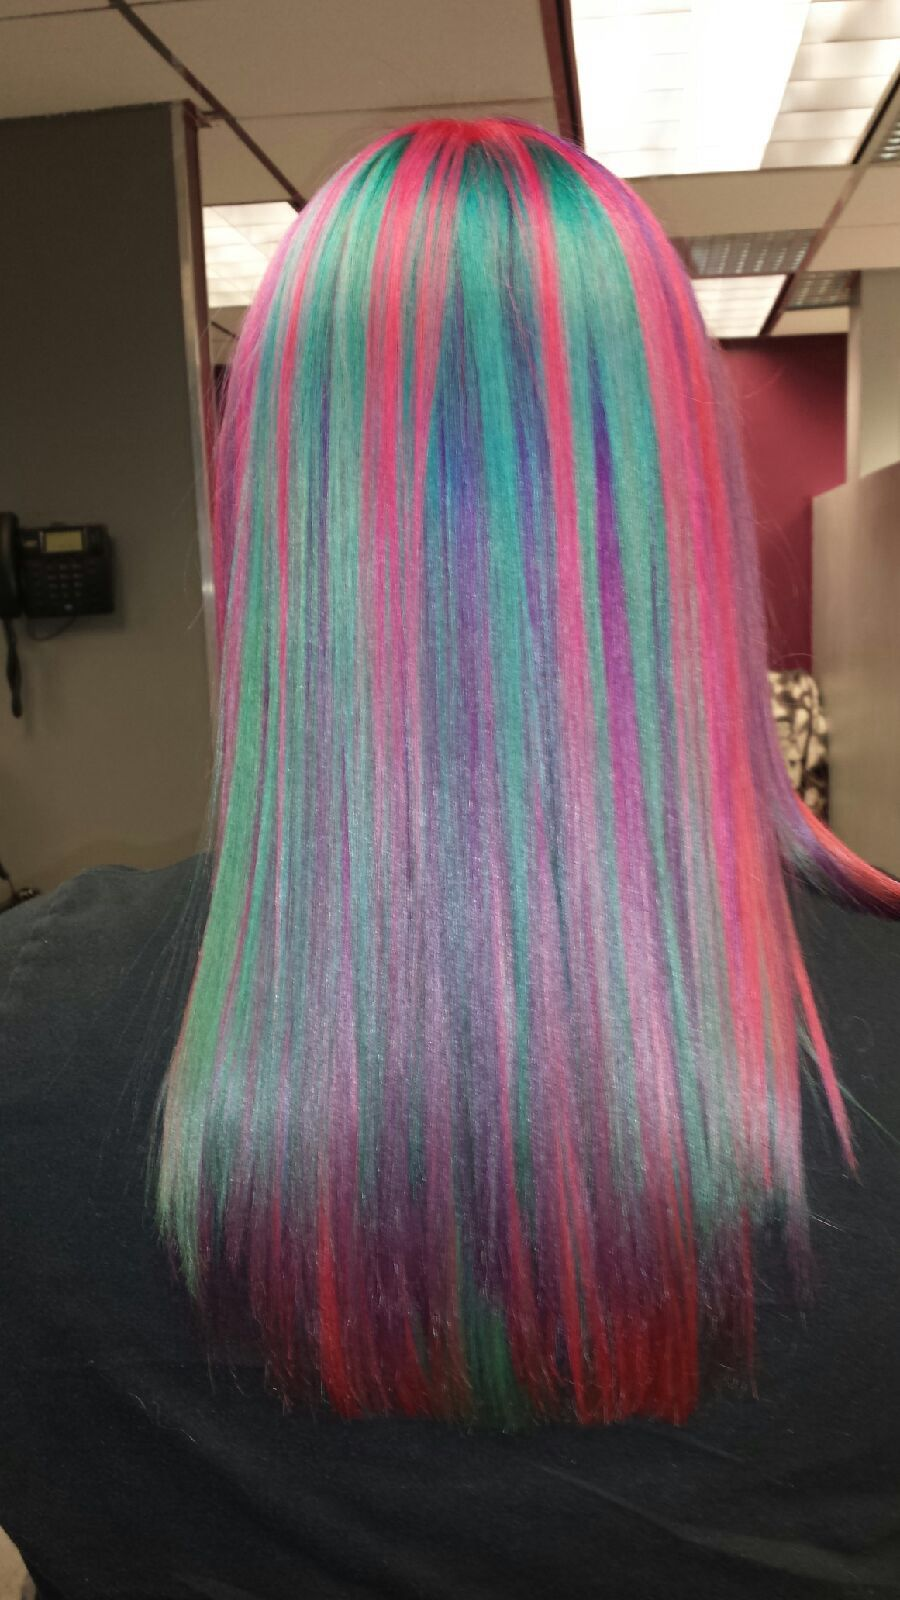 Pravana And Rusk Vivid Haircolor Salon180 Cool Hairstyles Hair Inspiration Dream Hair